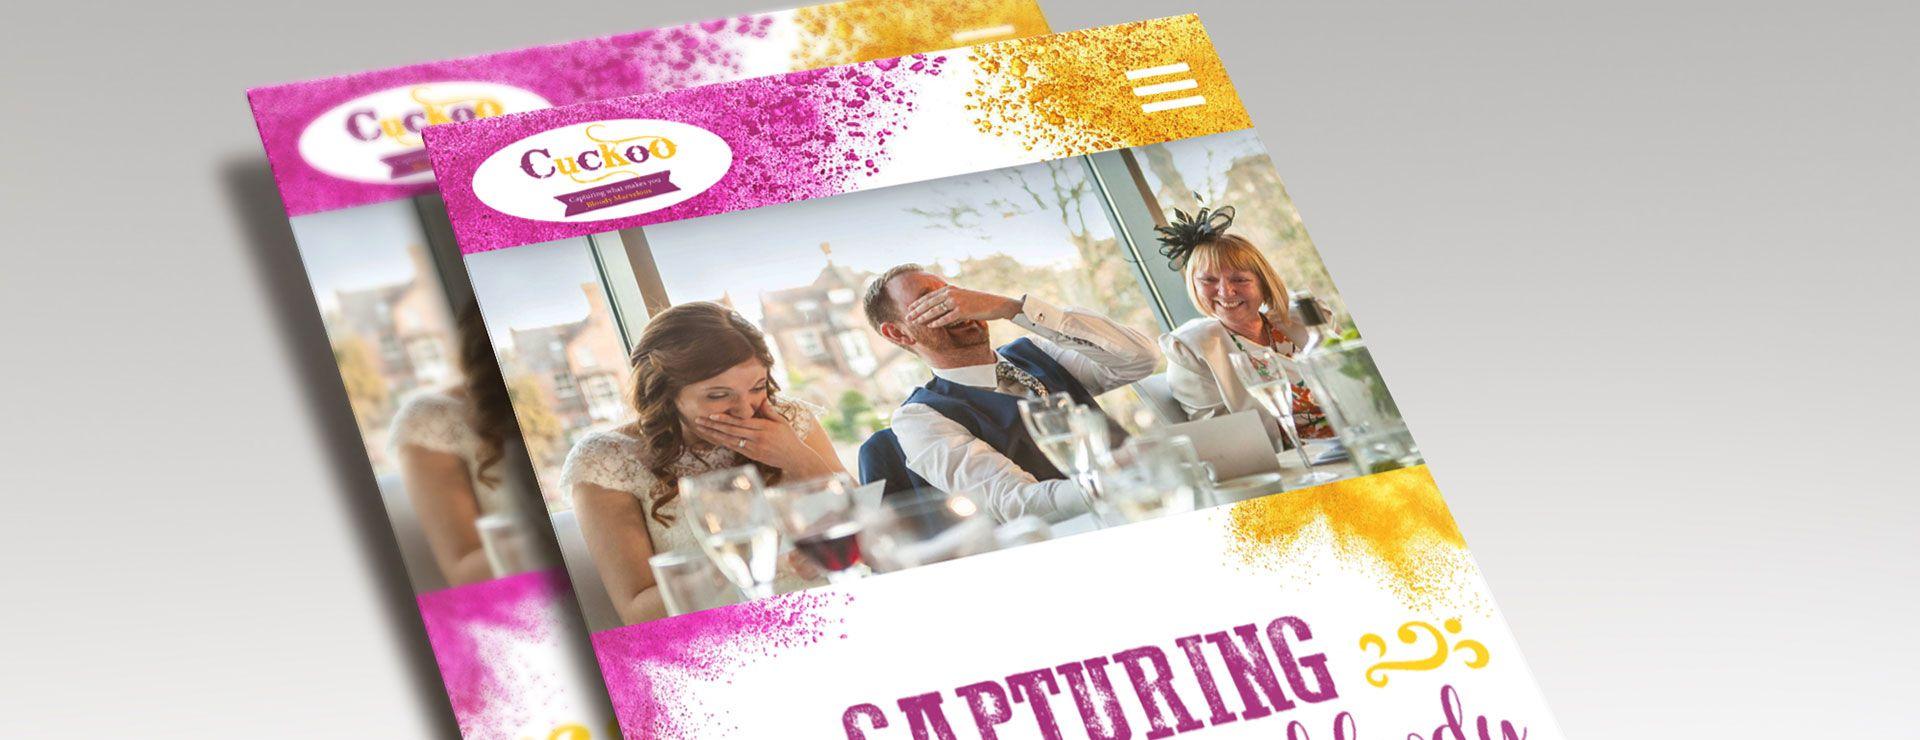 Cuckoo Wedding Photography Responsive Website Design